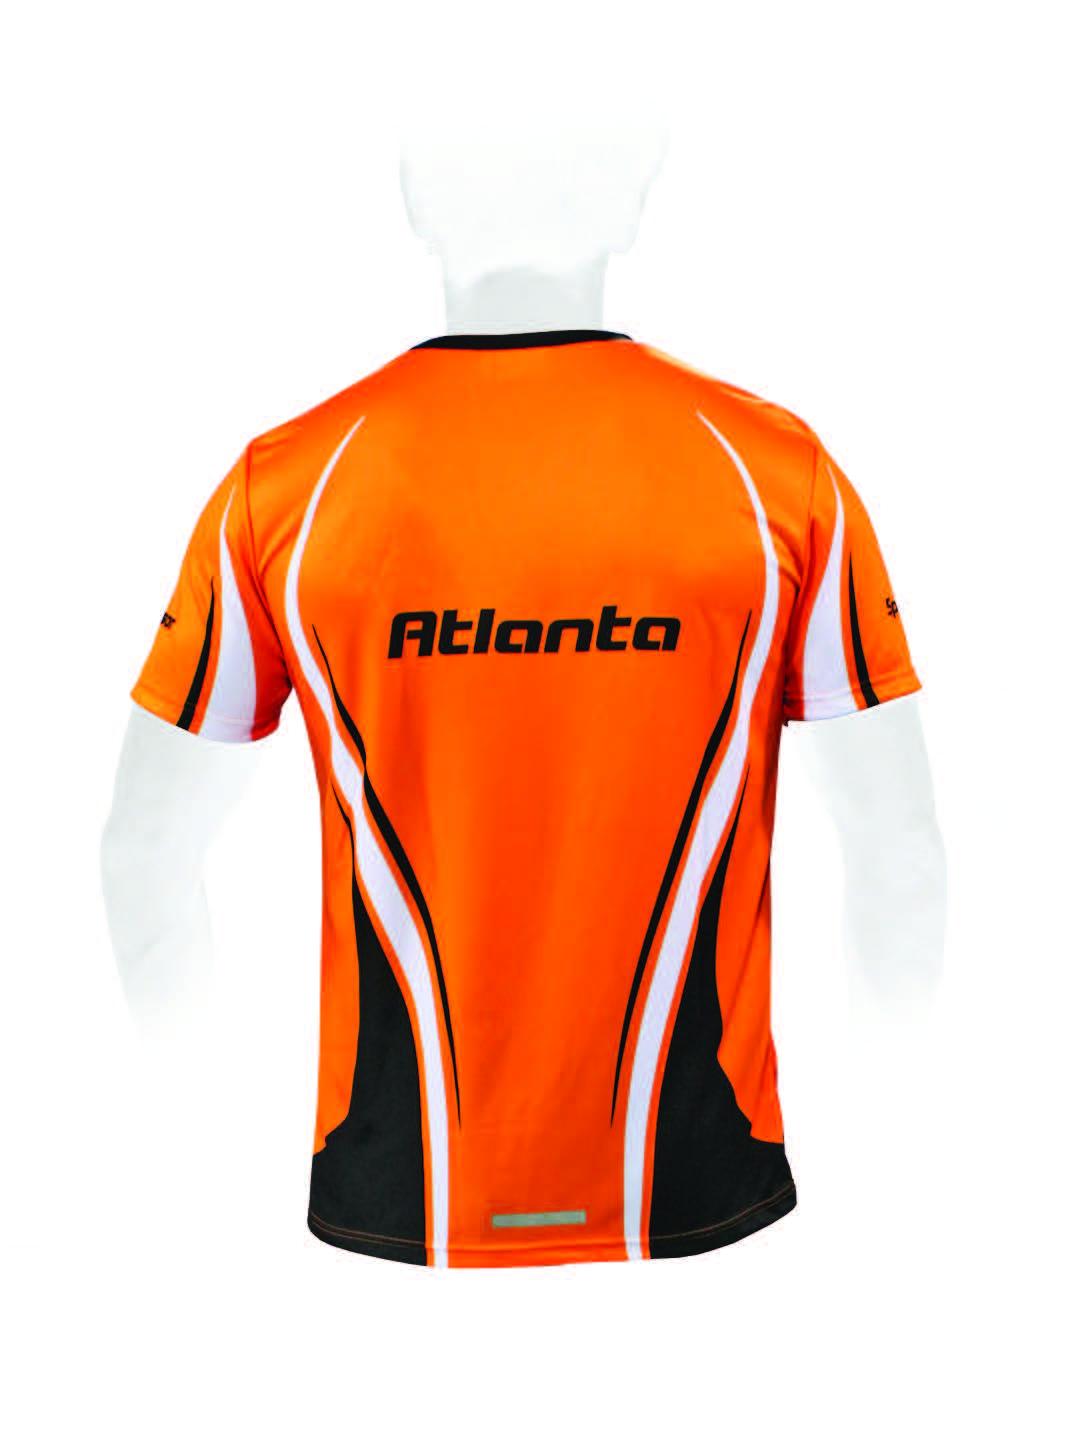 ATLANTA - 710201 dietro